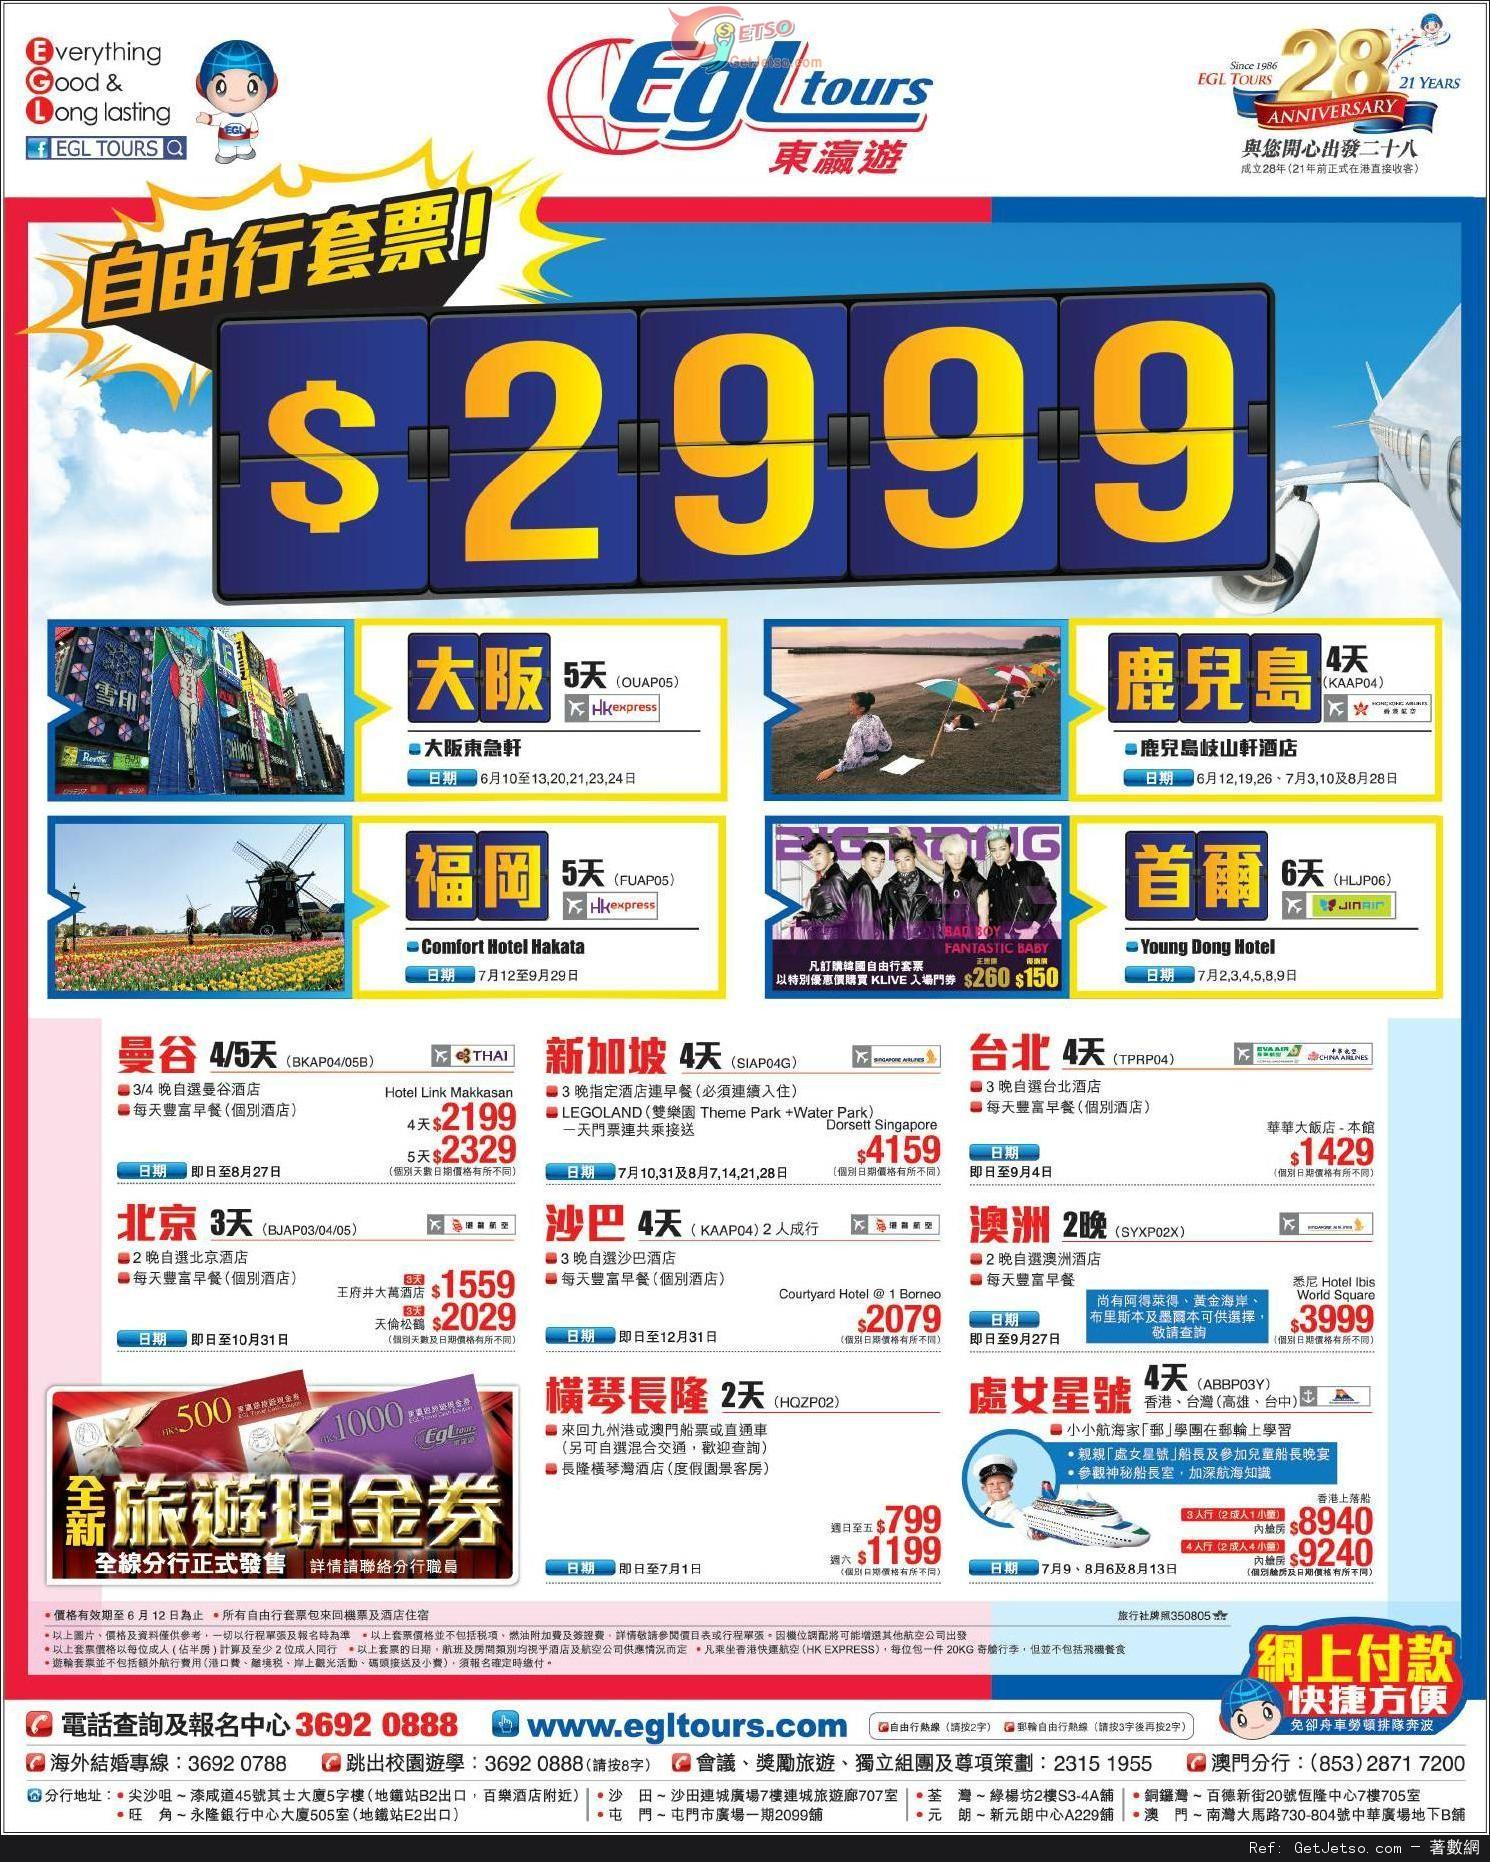 EGL 東瀛遊日本/韓國自由行套票$2999優惠 - Get Jetso 著數優惠網